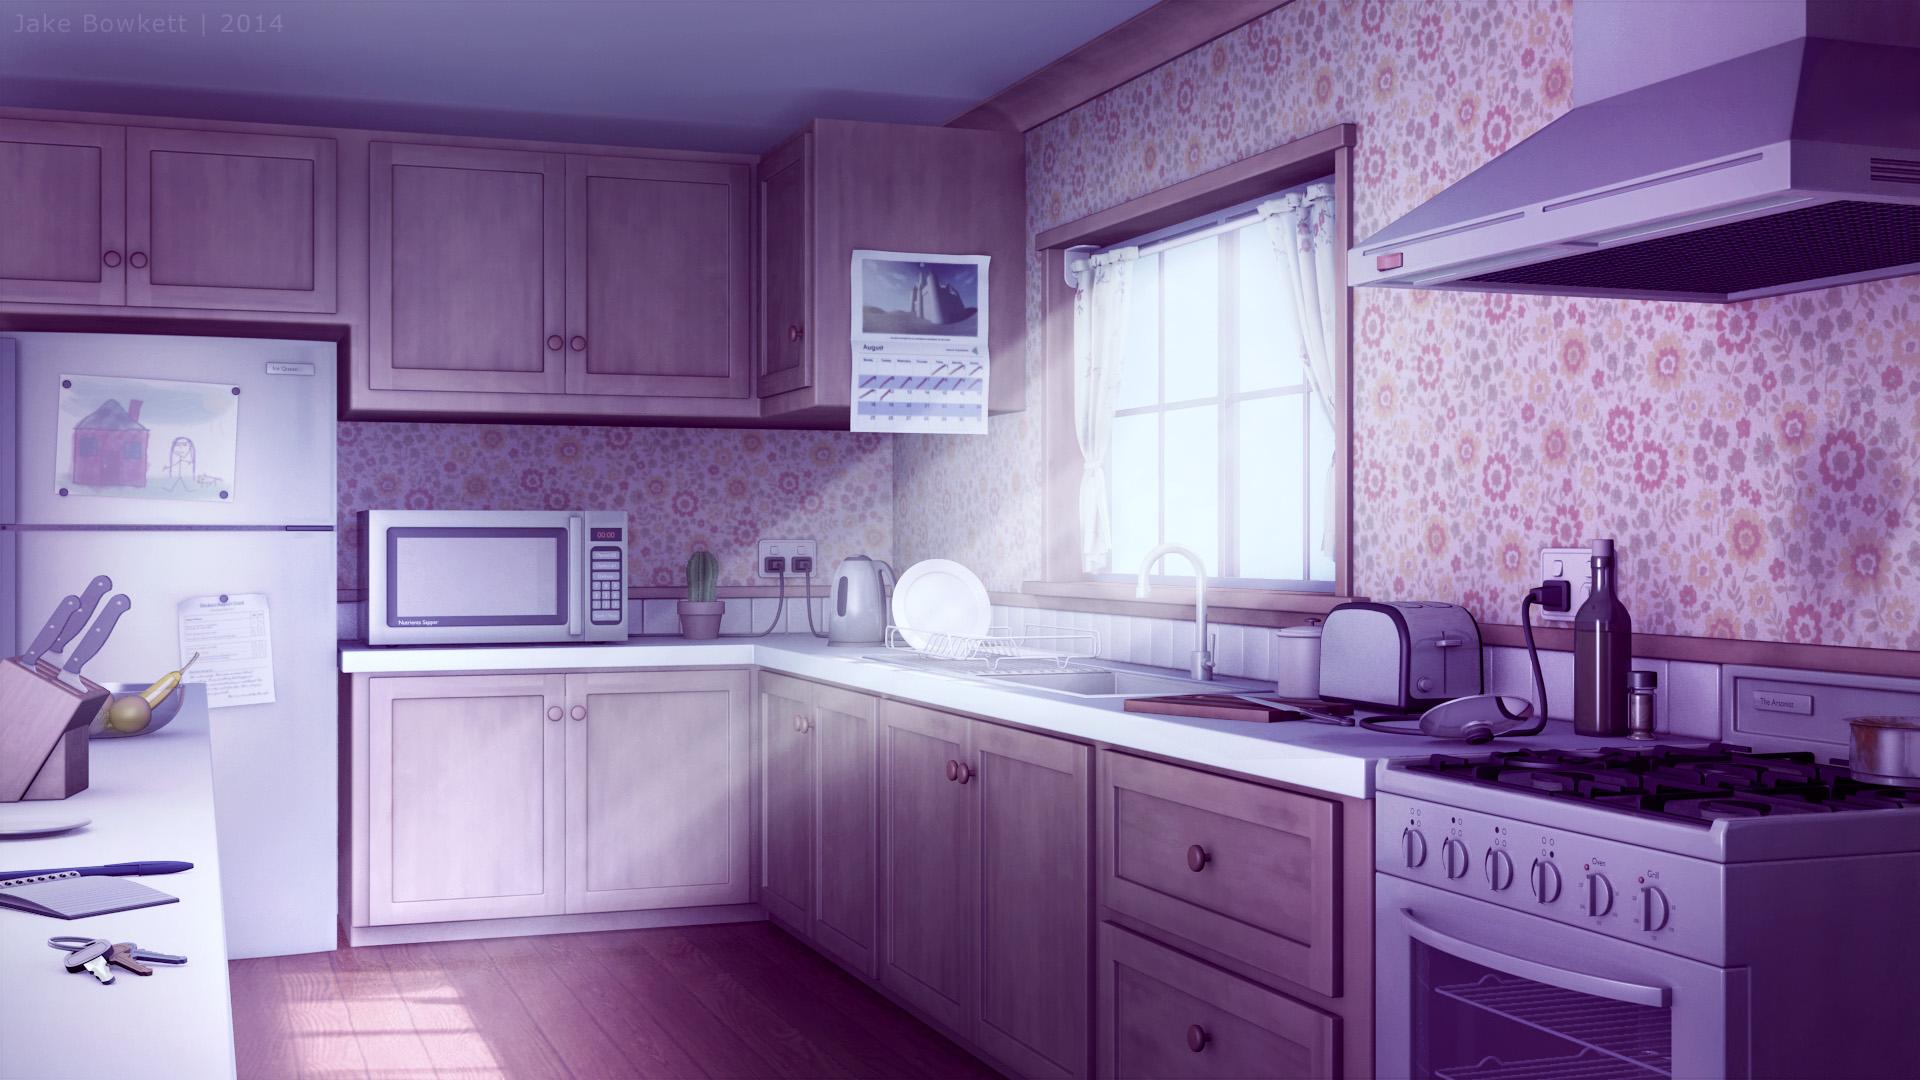 Piso 3 - dpto. #3 Kitchen_final_1920x1080_w